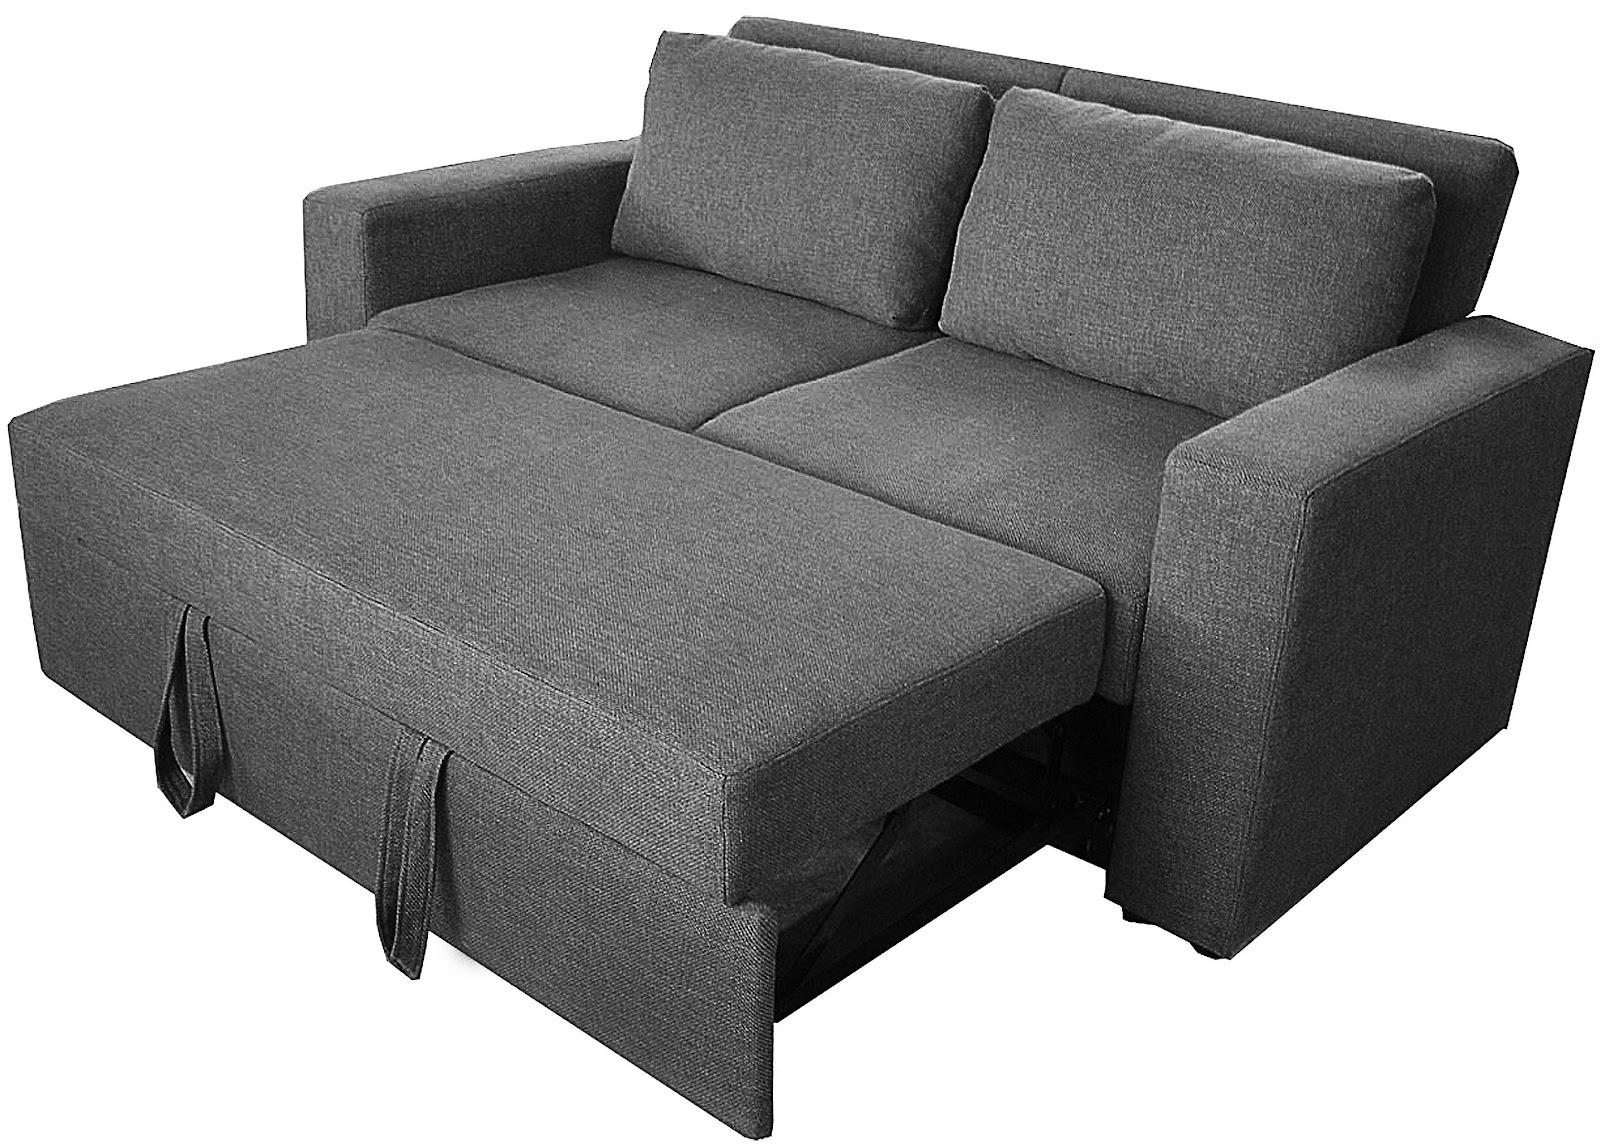 Sofa : Fancy Small Sofa Bed Ikea Small Sofa Bed Ikea Ikea Small In Trendy Ikea Small Sofas (View 18 of 20)